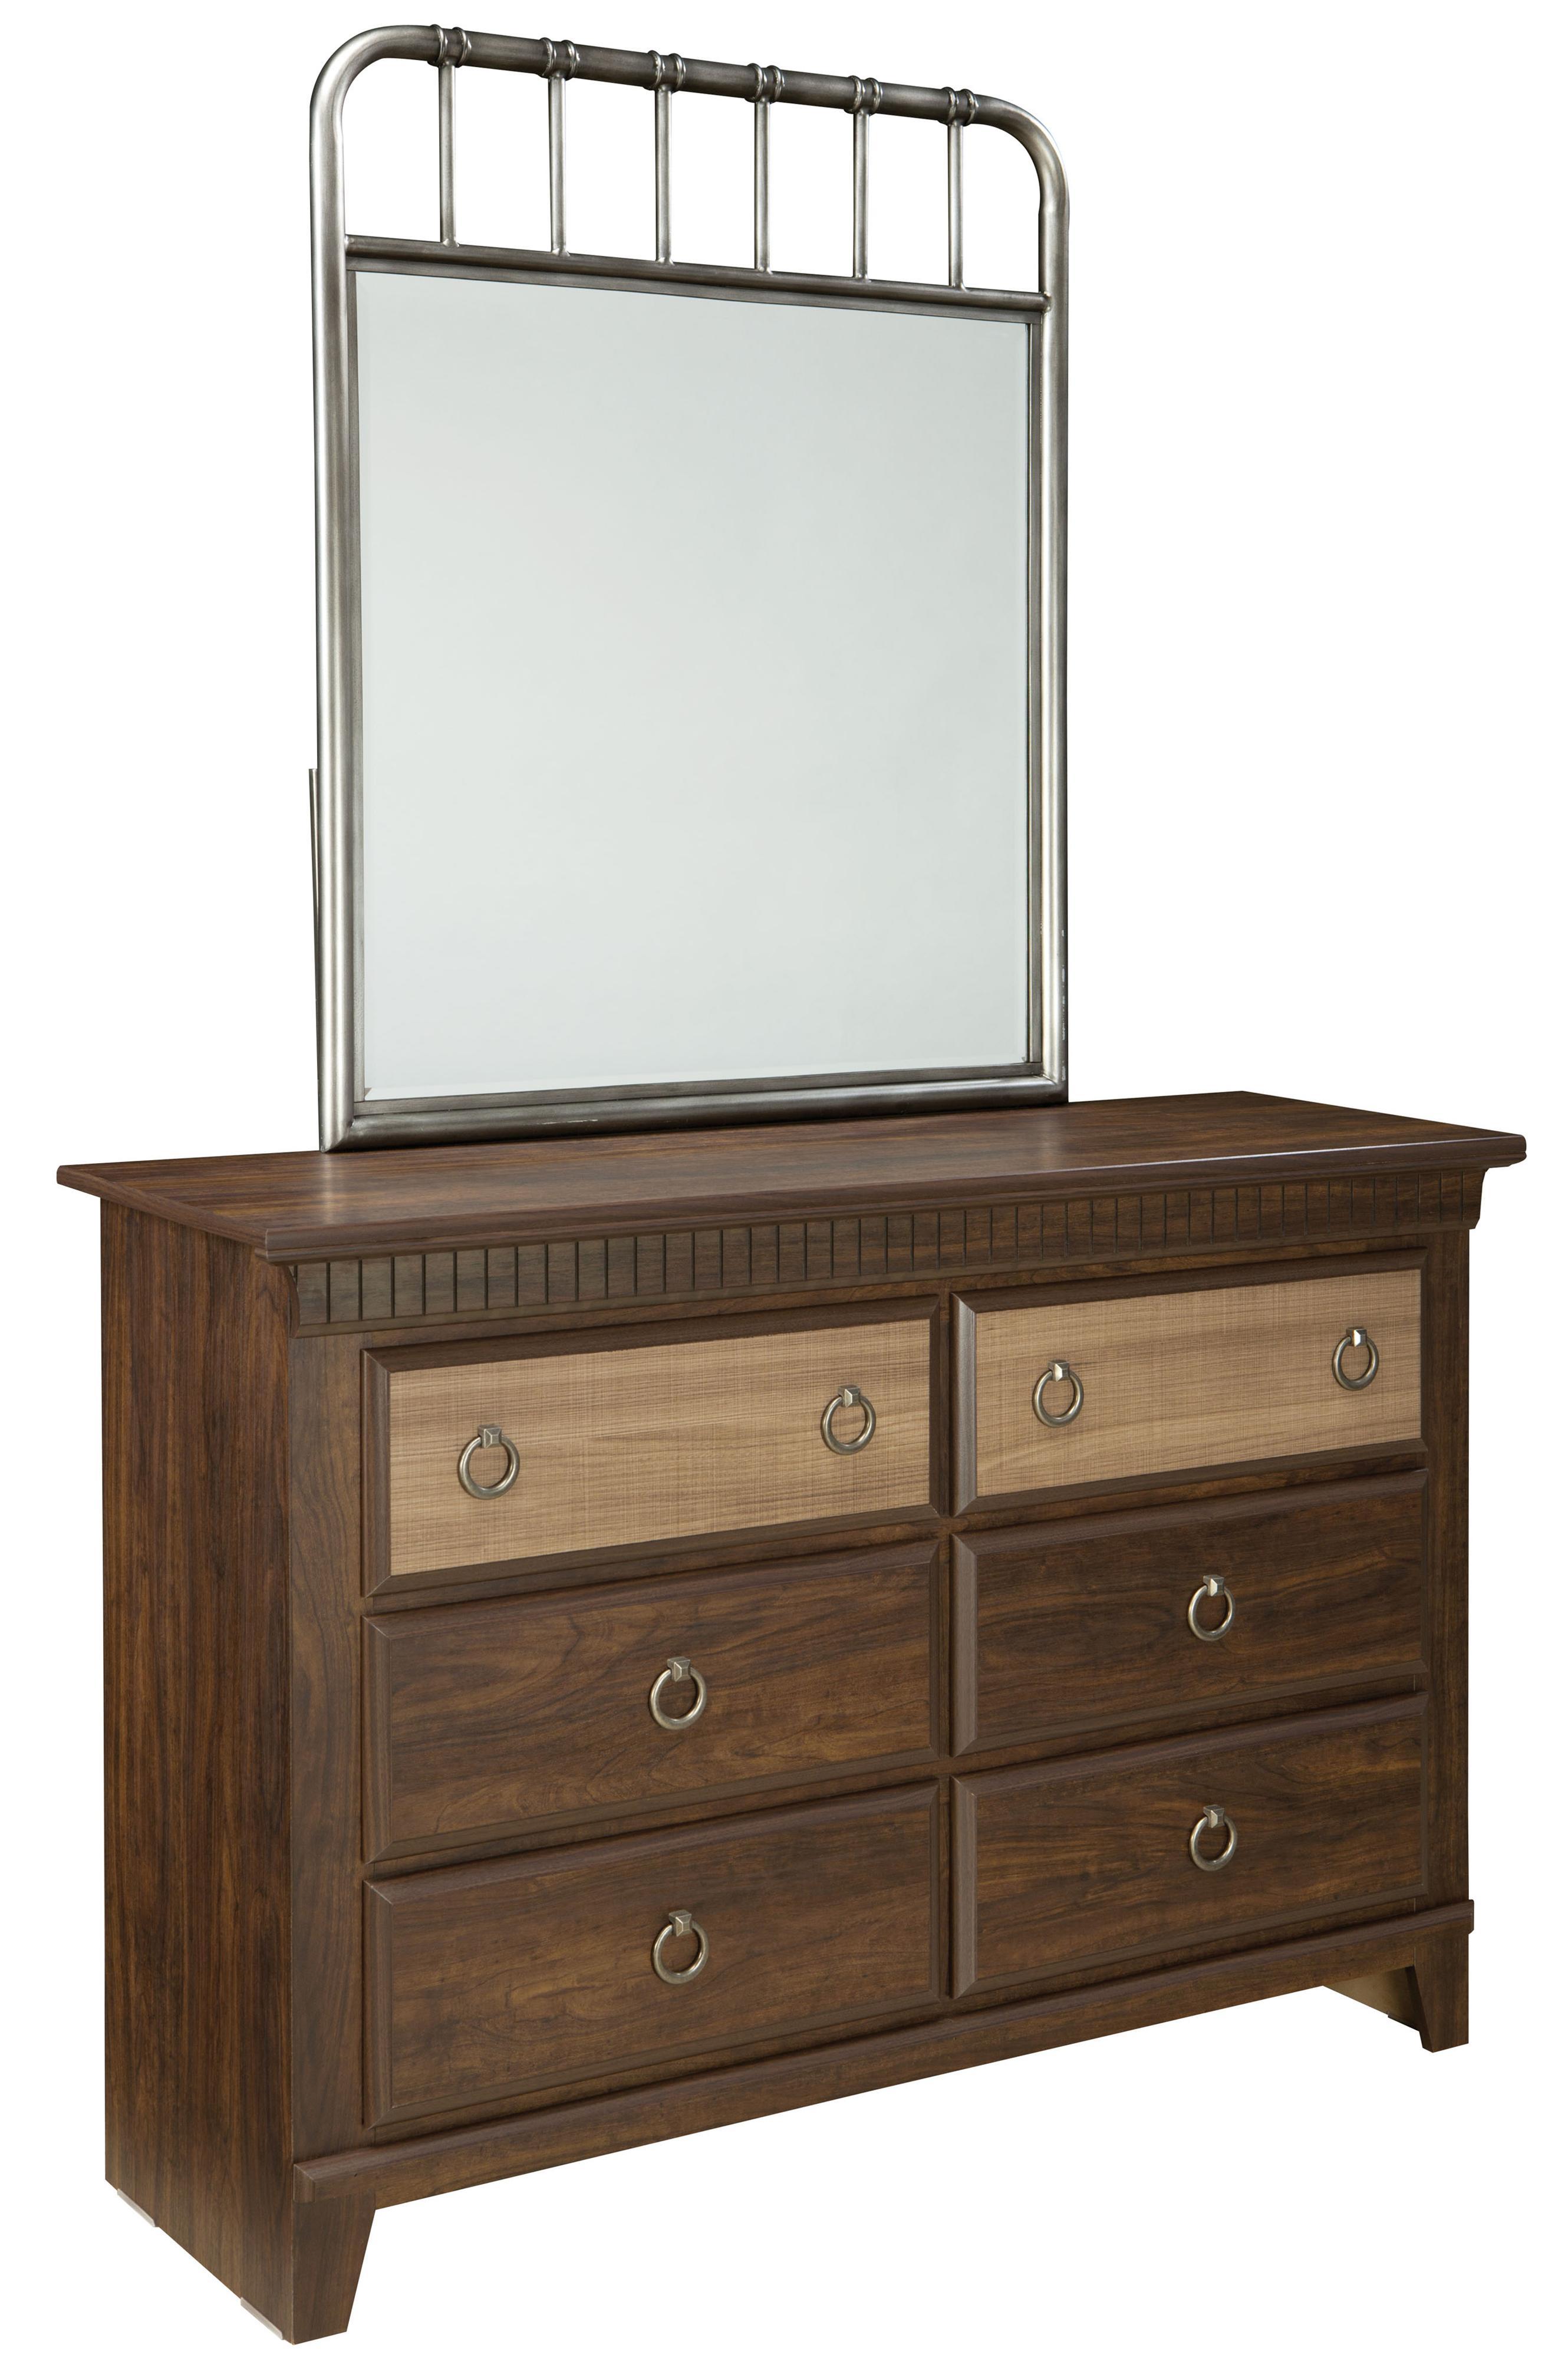 Standard Furniture Tristen Dresser and Mirror Combination - Item Number: 68159+87508